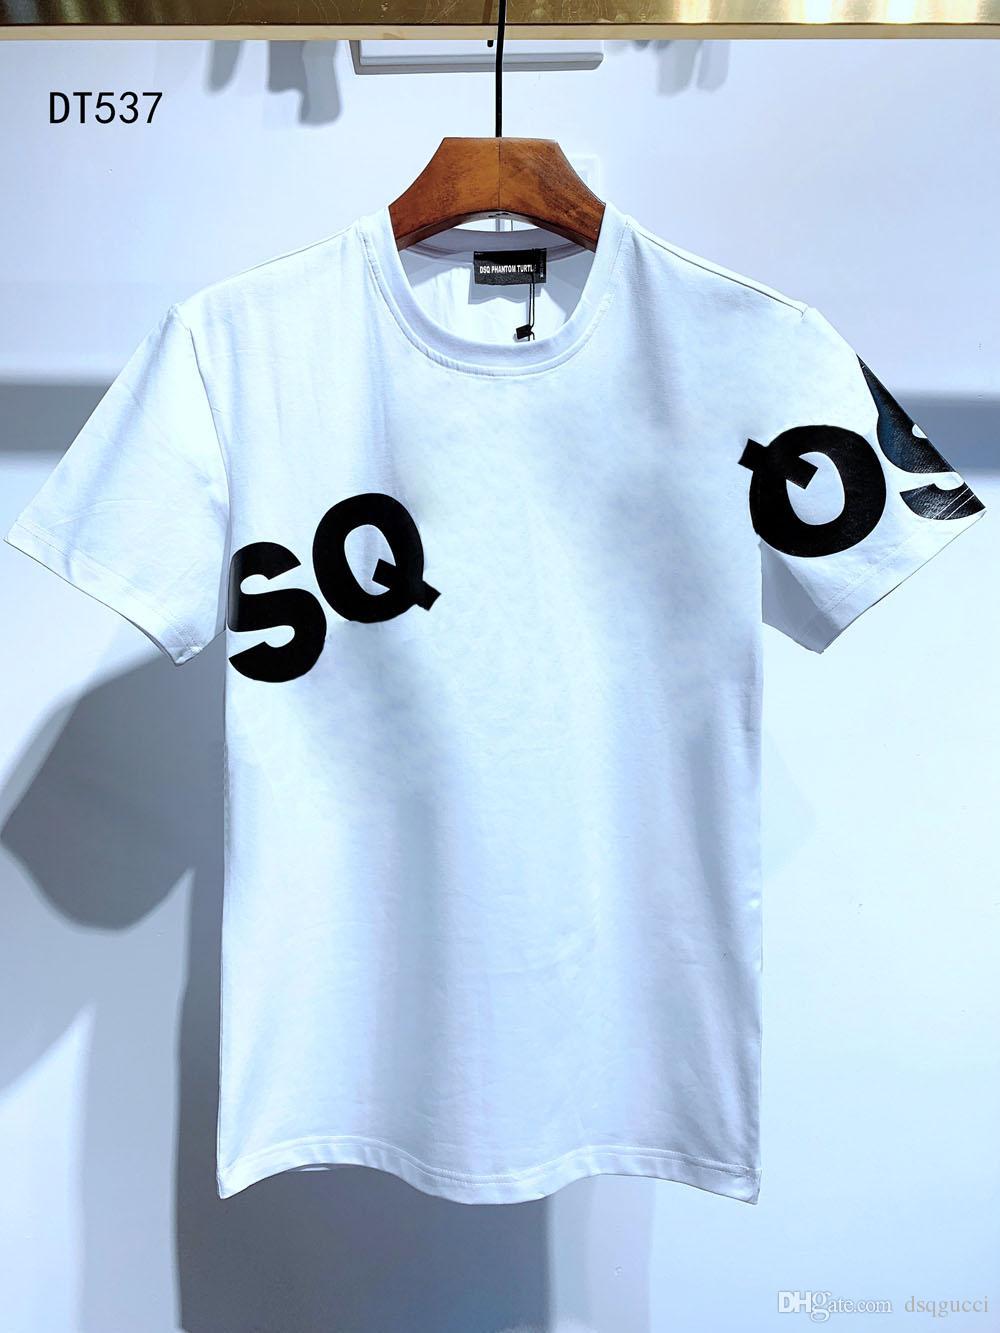 DSQ Mens Designer T Shirt Black White Men Estate Moda Casual Street T-Shirt Top Manica corta Euro Taglia M-XXXL 6872